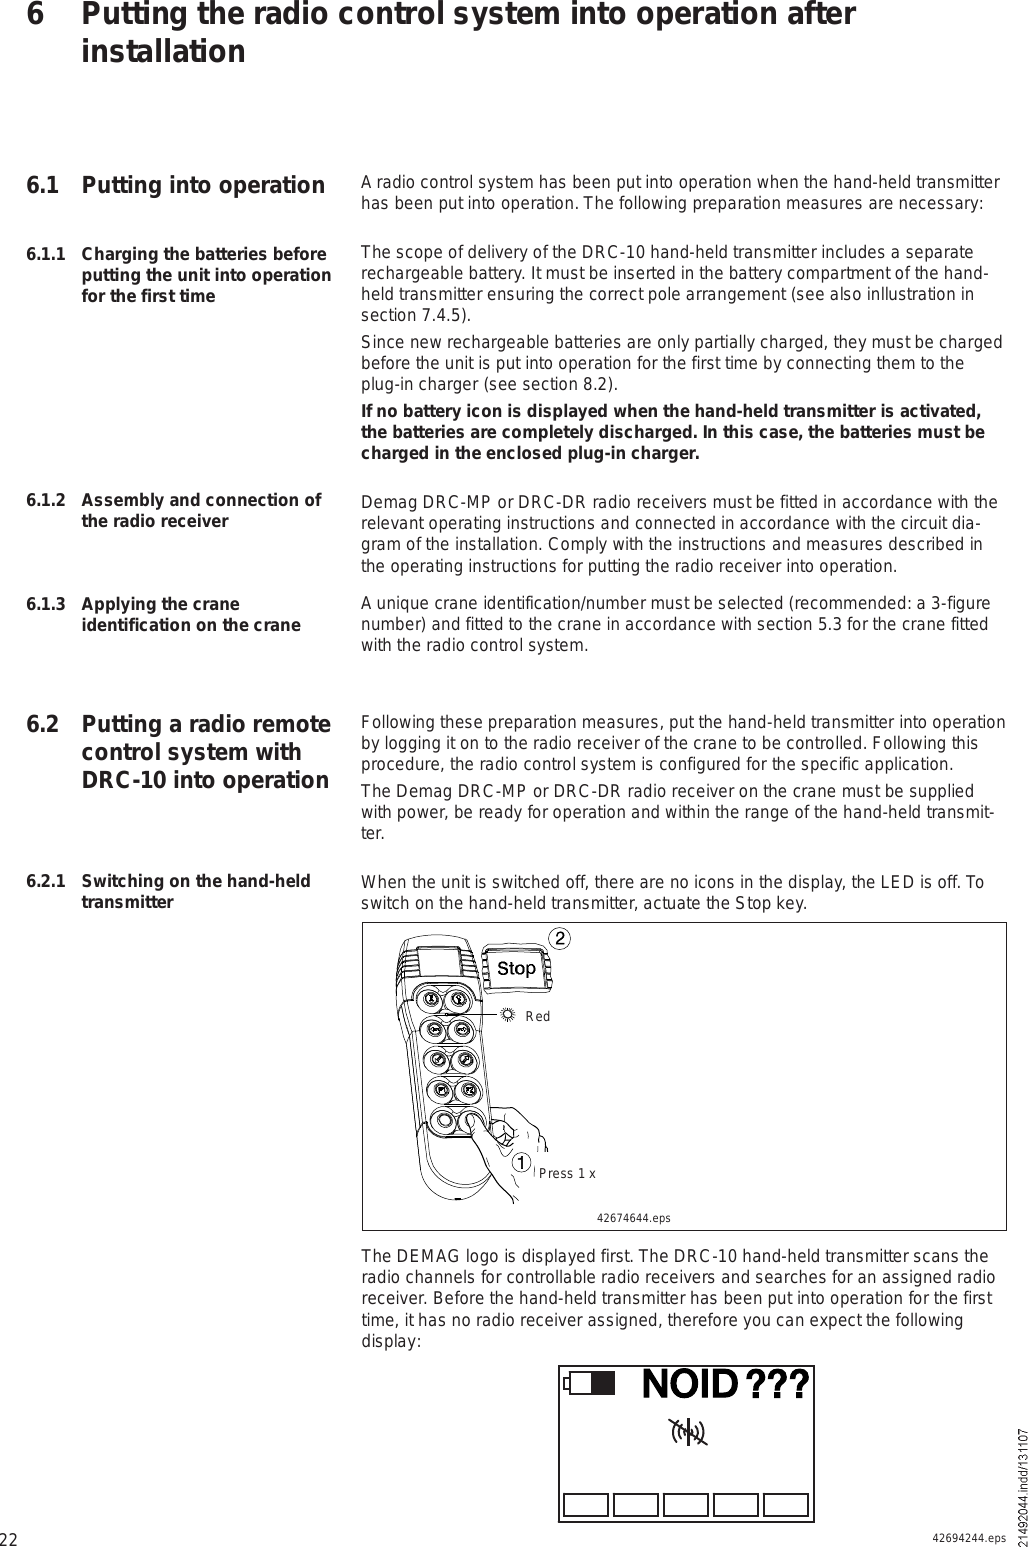 [ANLQ_8698]  Scanreco D210TR03FH917 Remote Control User Manual DRC 10 | Demag Drc Dc Wiring Diagram |  | UserManual.wiki